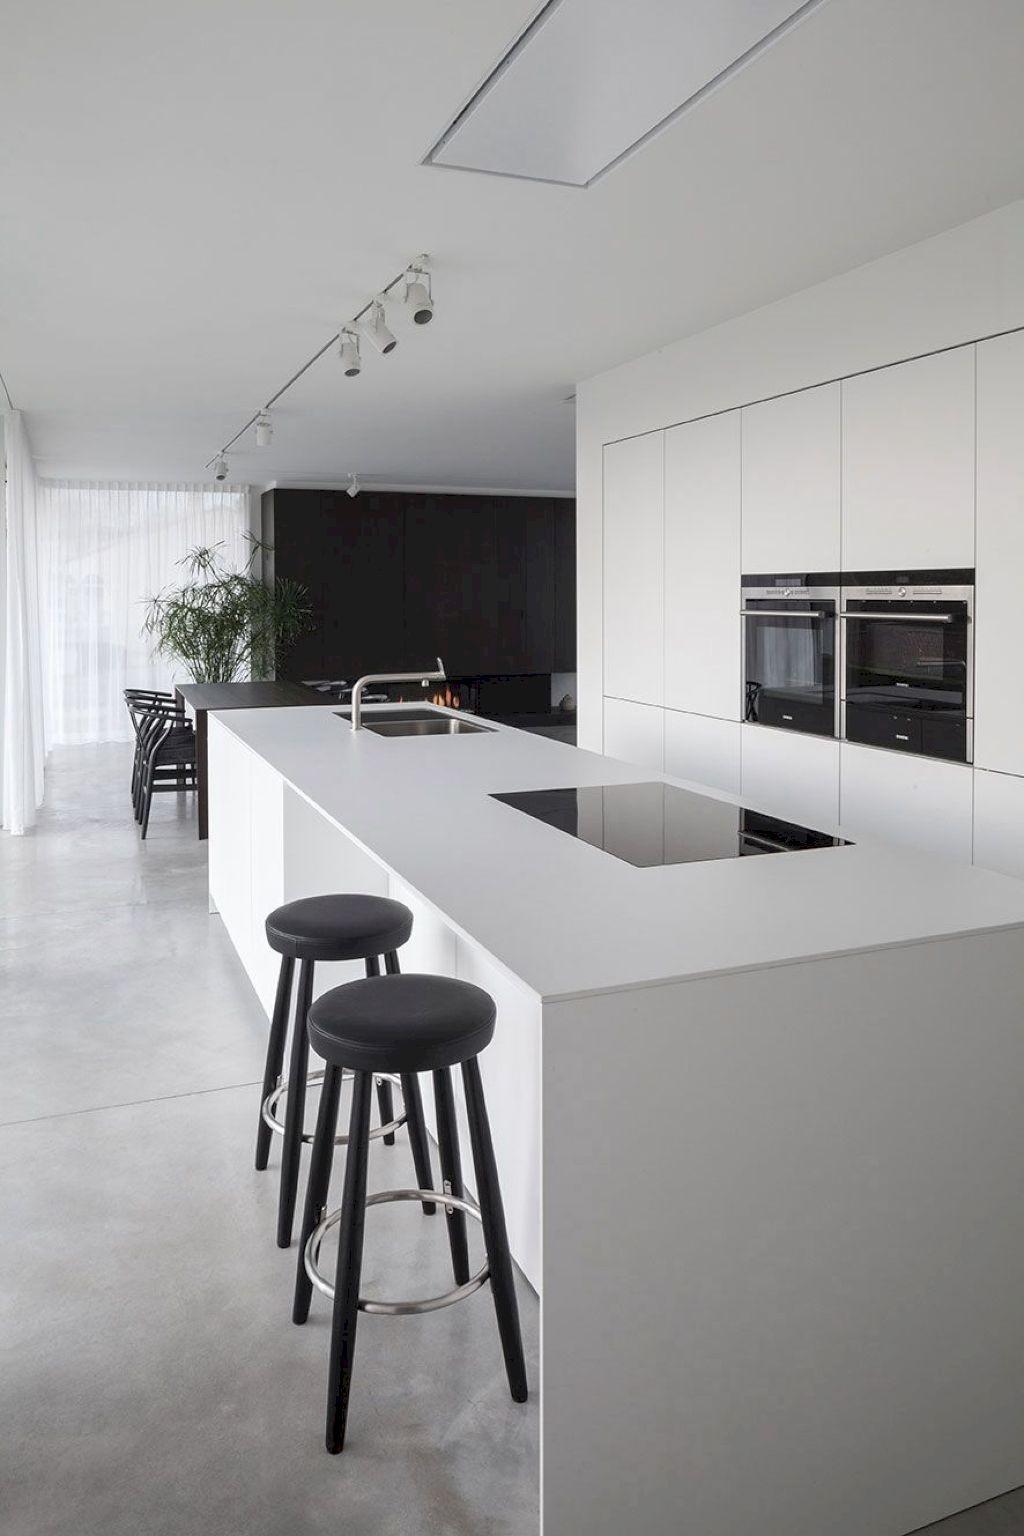 80 Luxury White Kitchen Design and Decor Ideas images